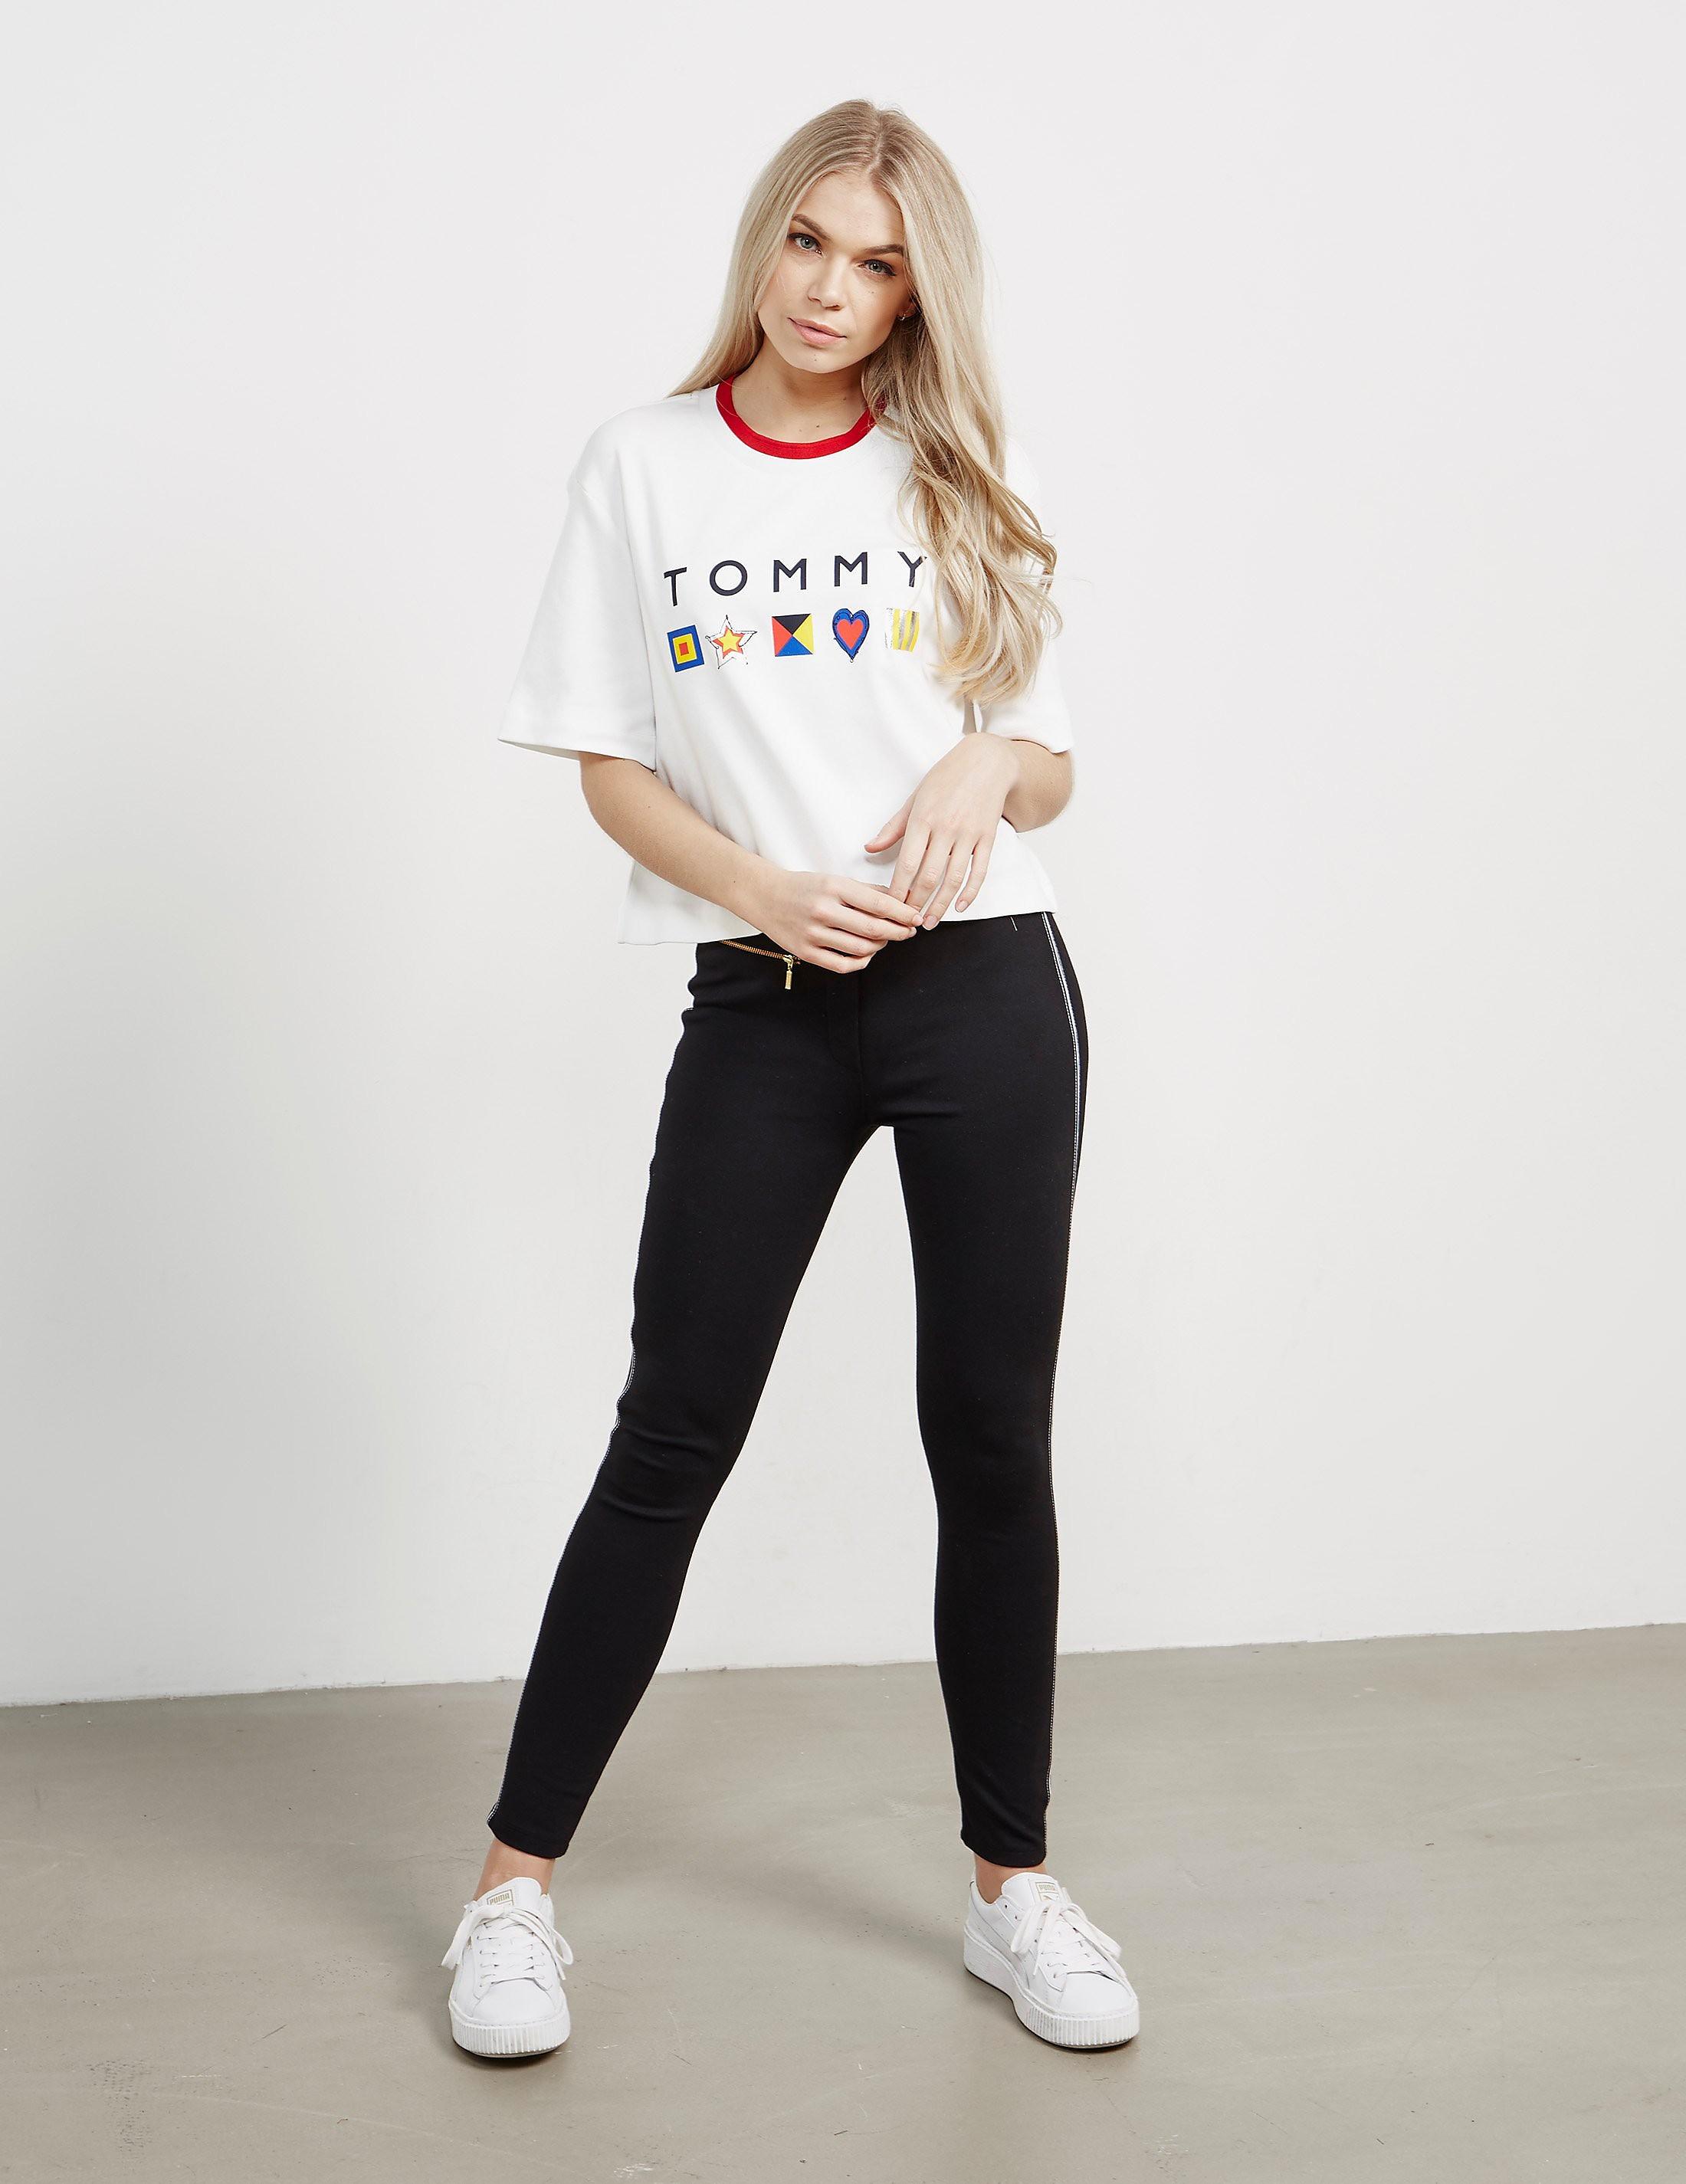 Tommy Hilfiger Abby Short Sleeve T-Shirt